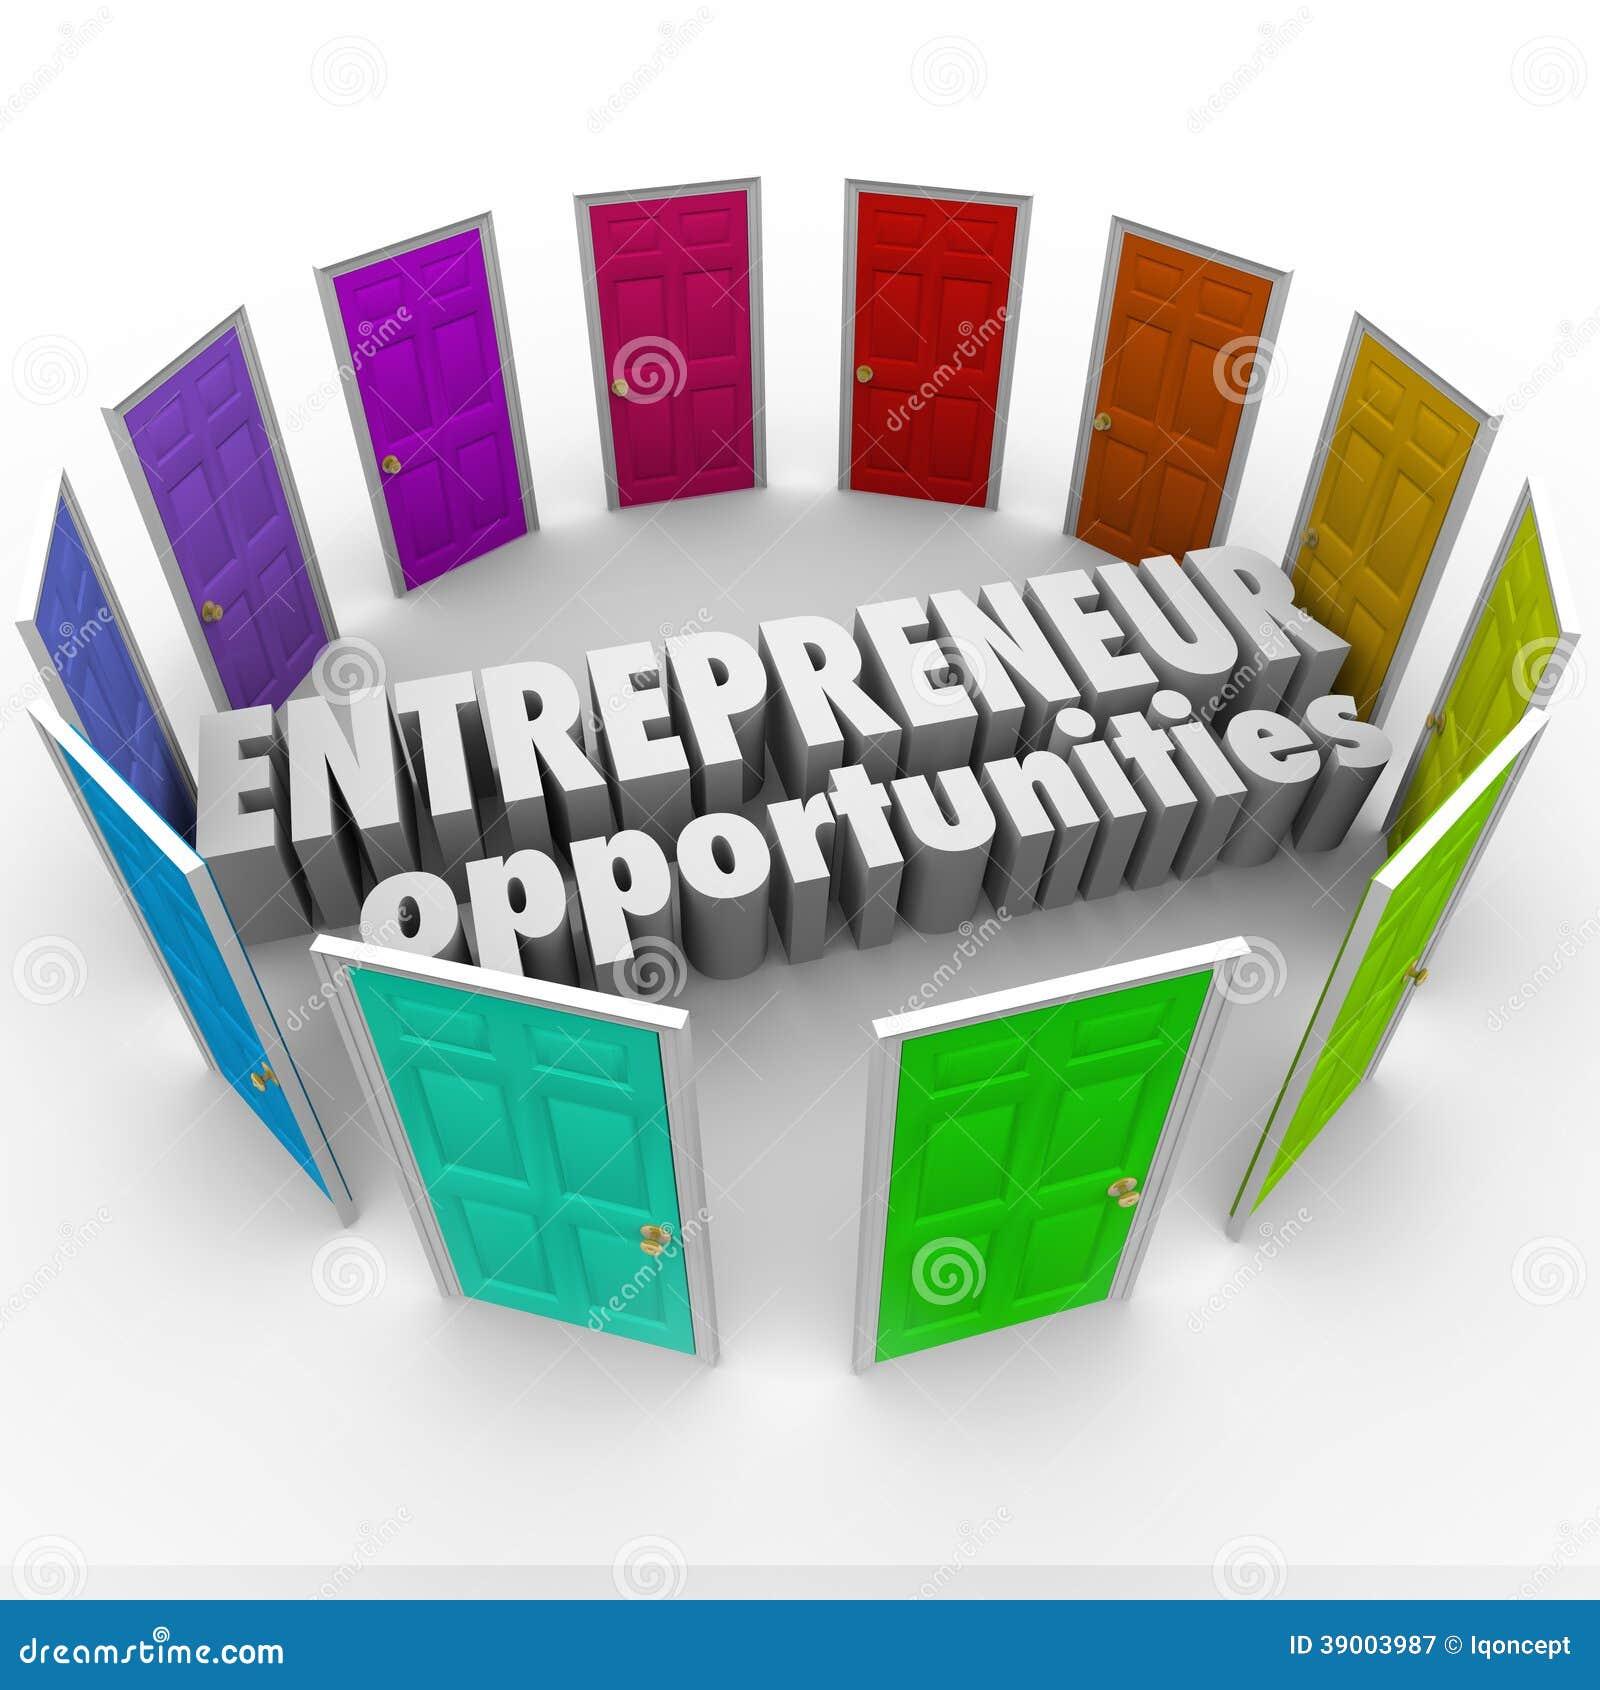 EntreprenörOpportunities Many Business banor